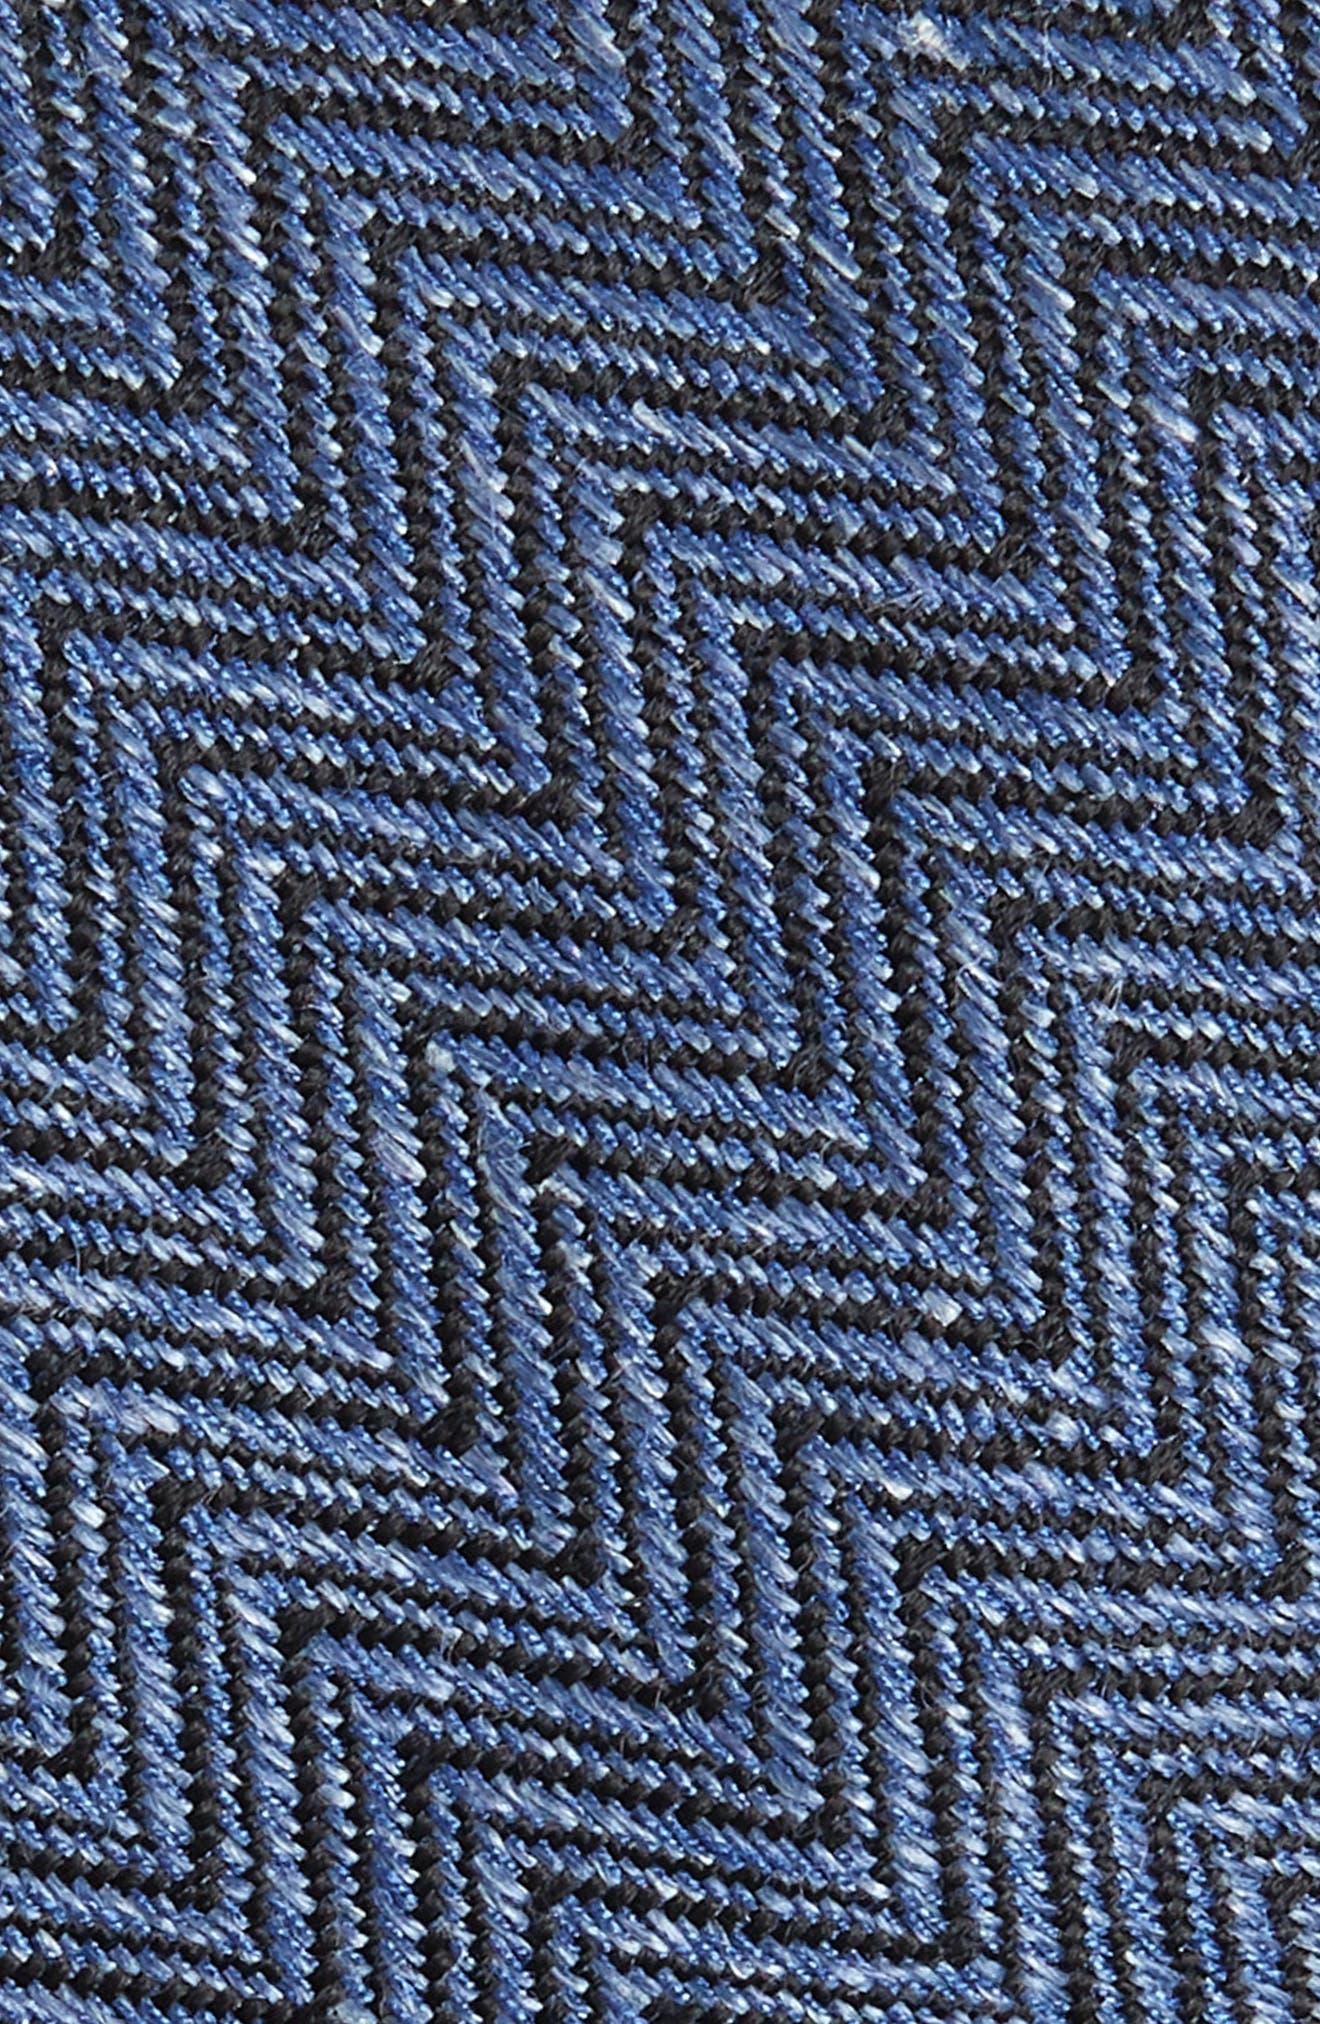 Chevron Silk & Linen Tie,                             Alternate thumbnail 2, color,                             BLUE